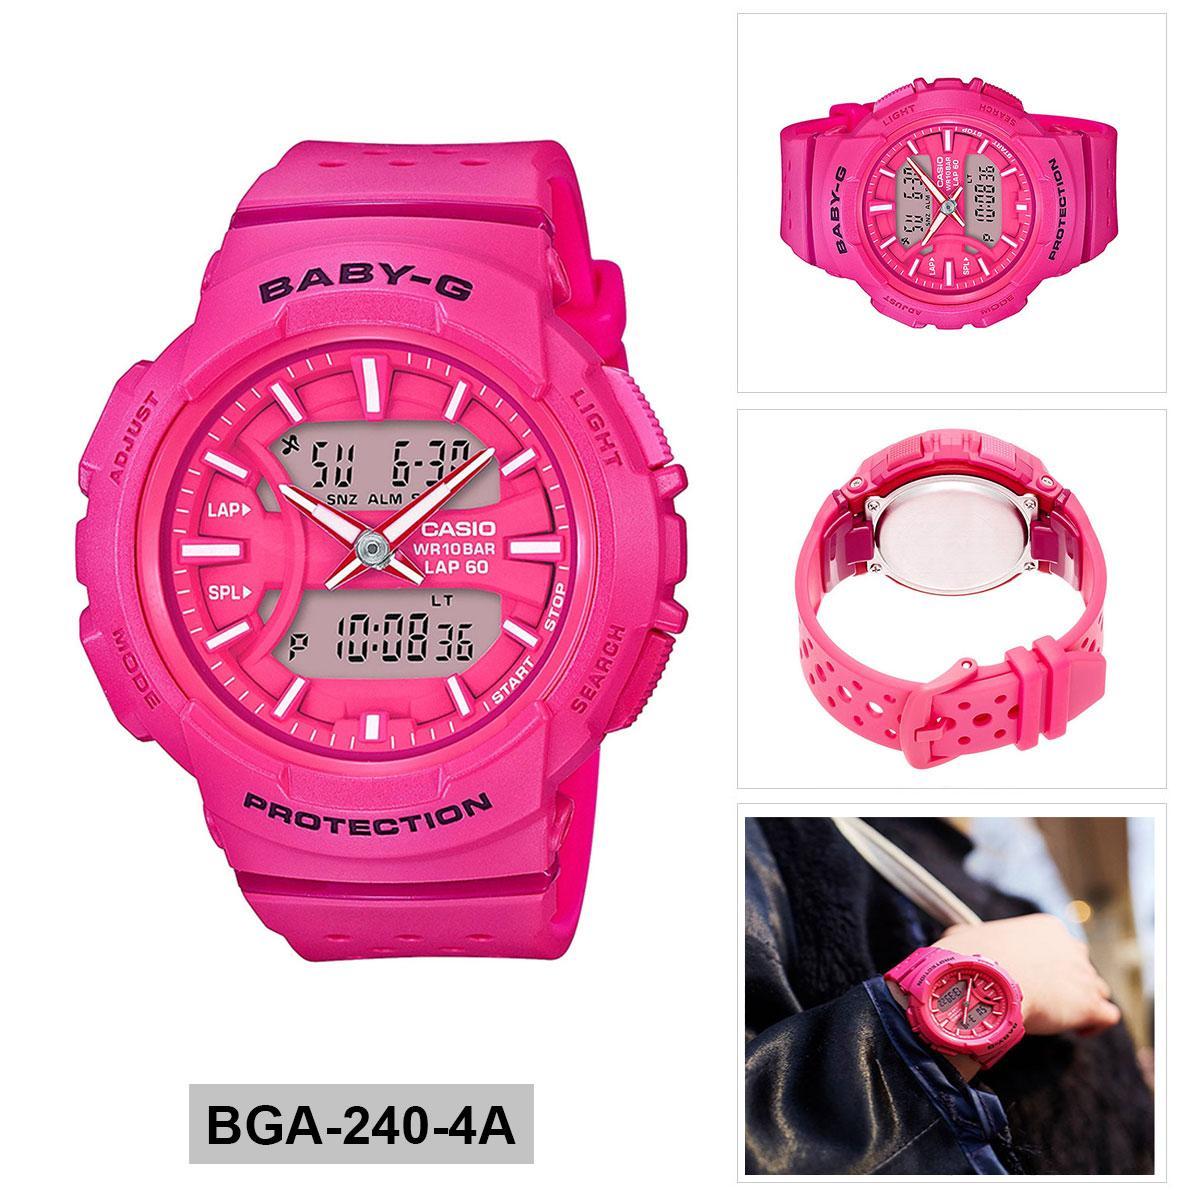 Casio Baby G Bga 150ef 4b Pink Intl Singapore Price Specs 230 7b2 Original For Running Resin Case Strap Ladies 240 4a